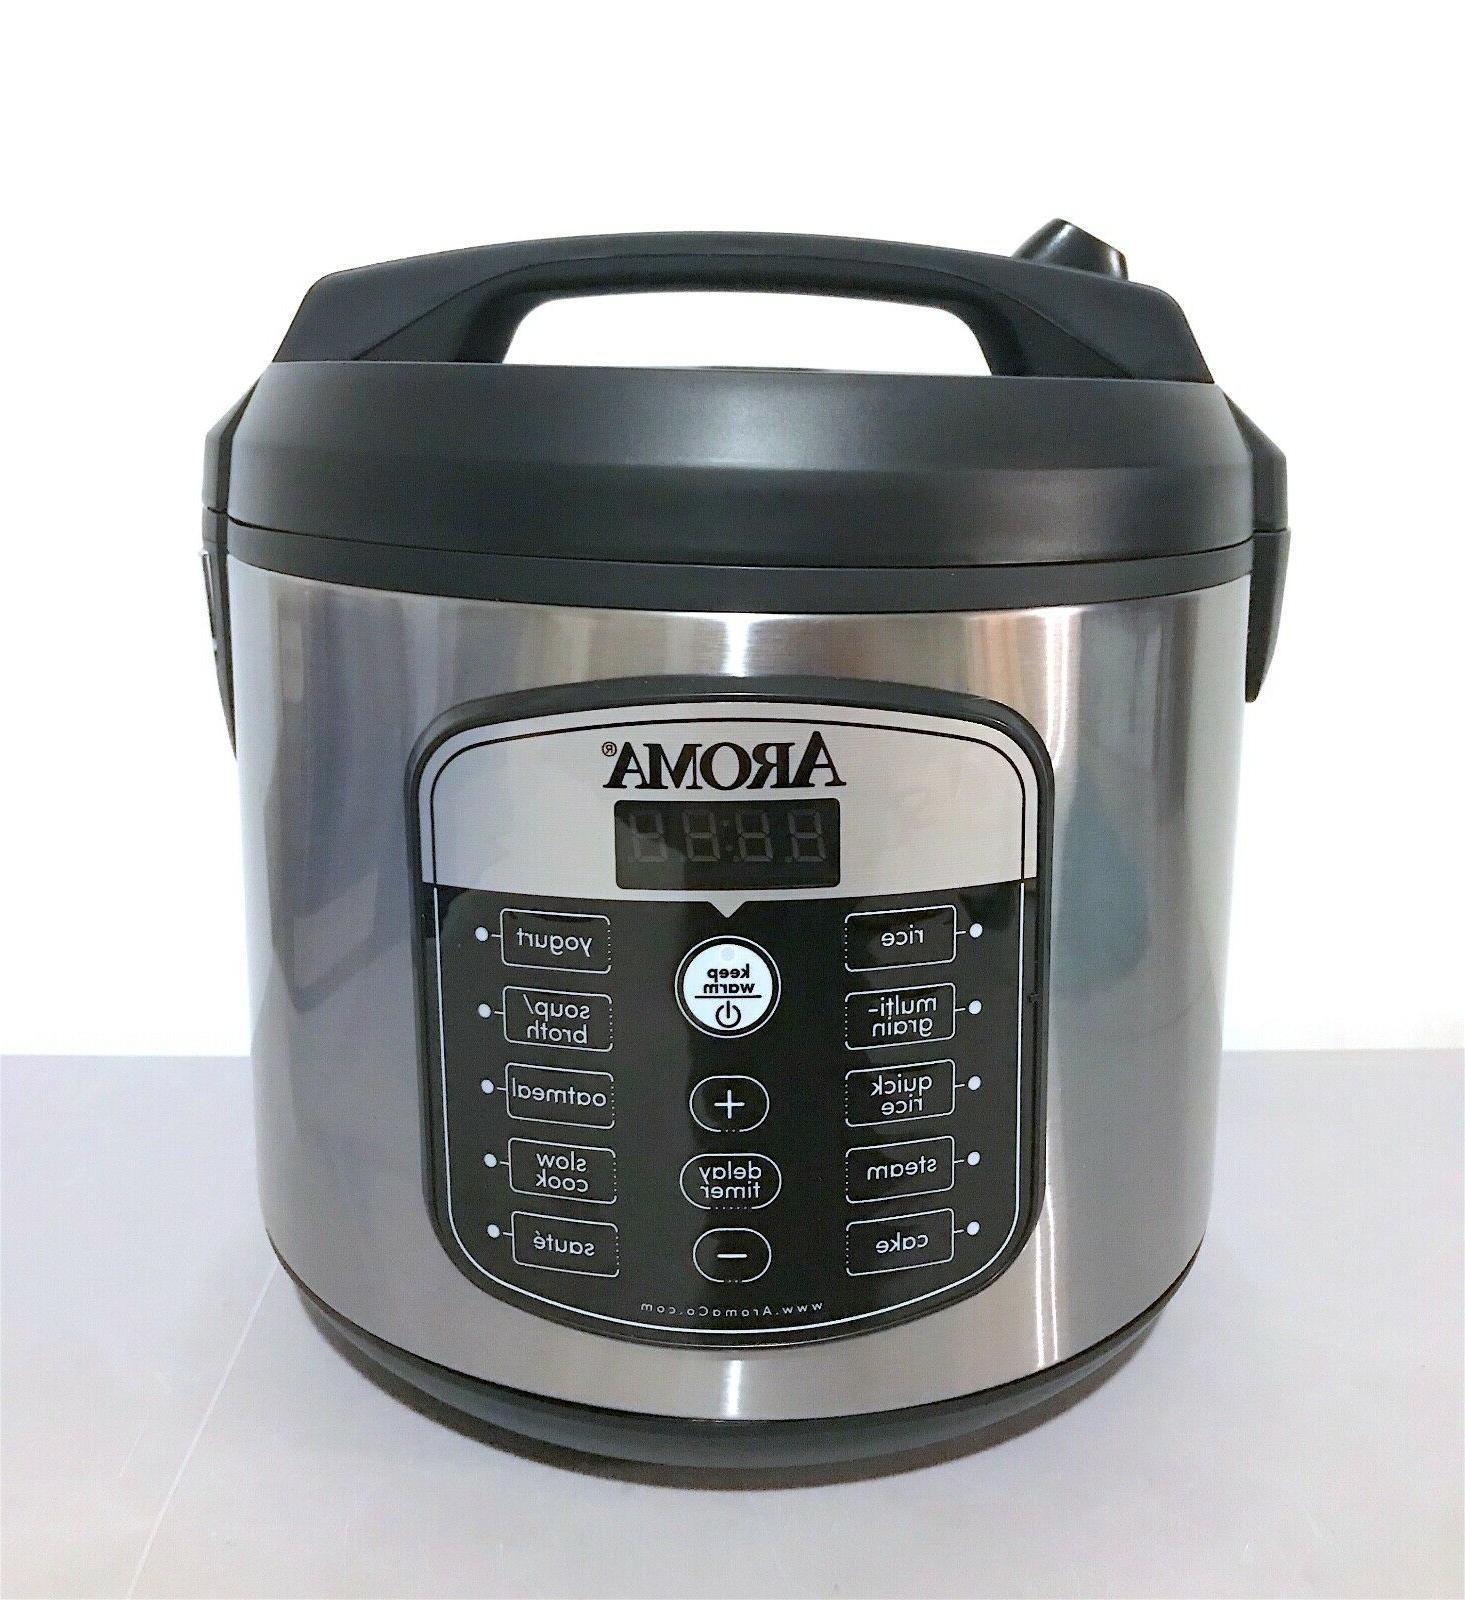 AROMA 5 Quart and Steamer ARC-1040SB